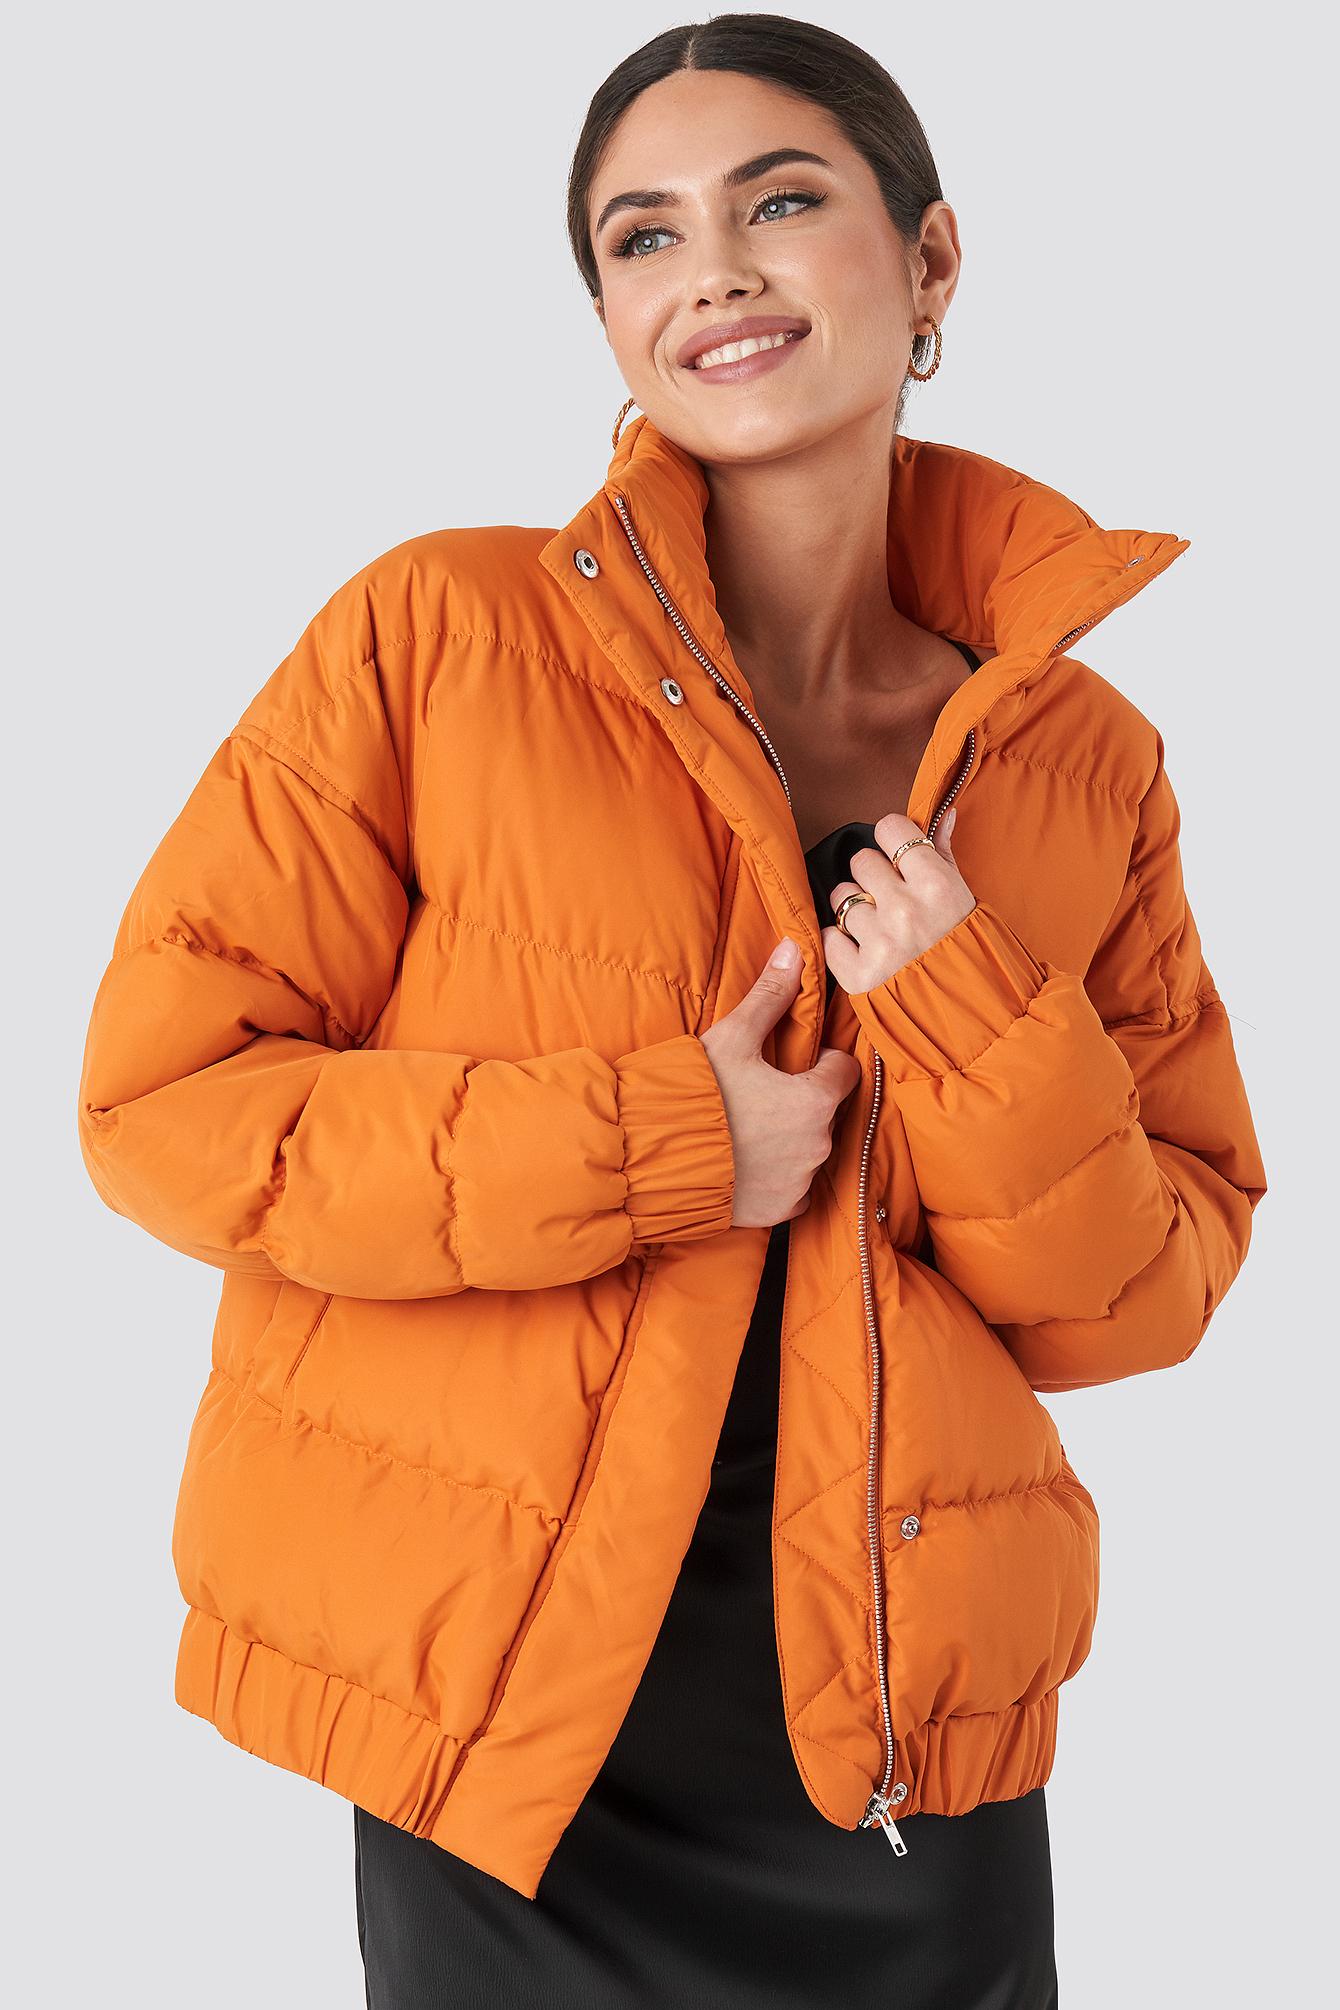 sparkz -  Amelia Jacket - Orange